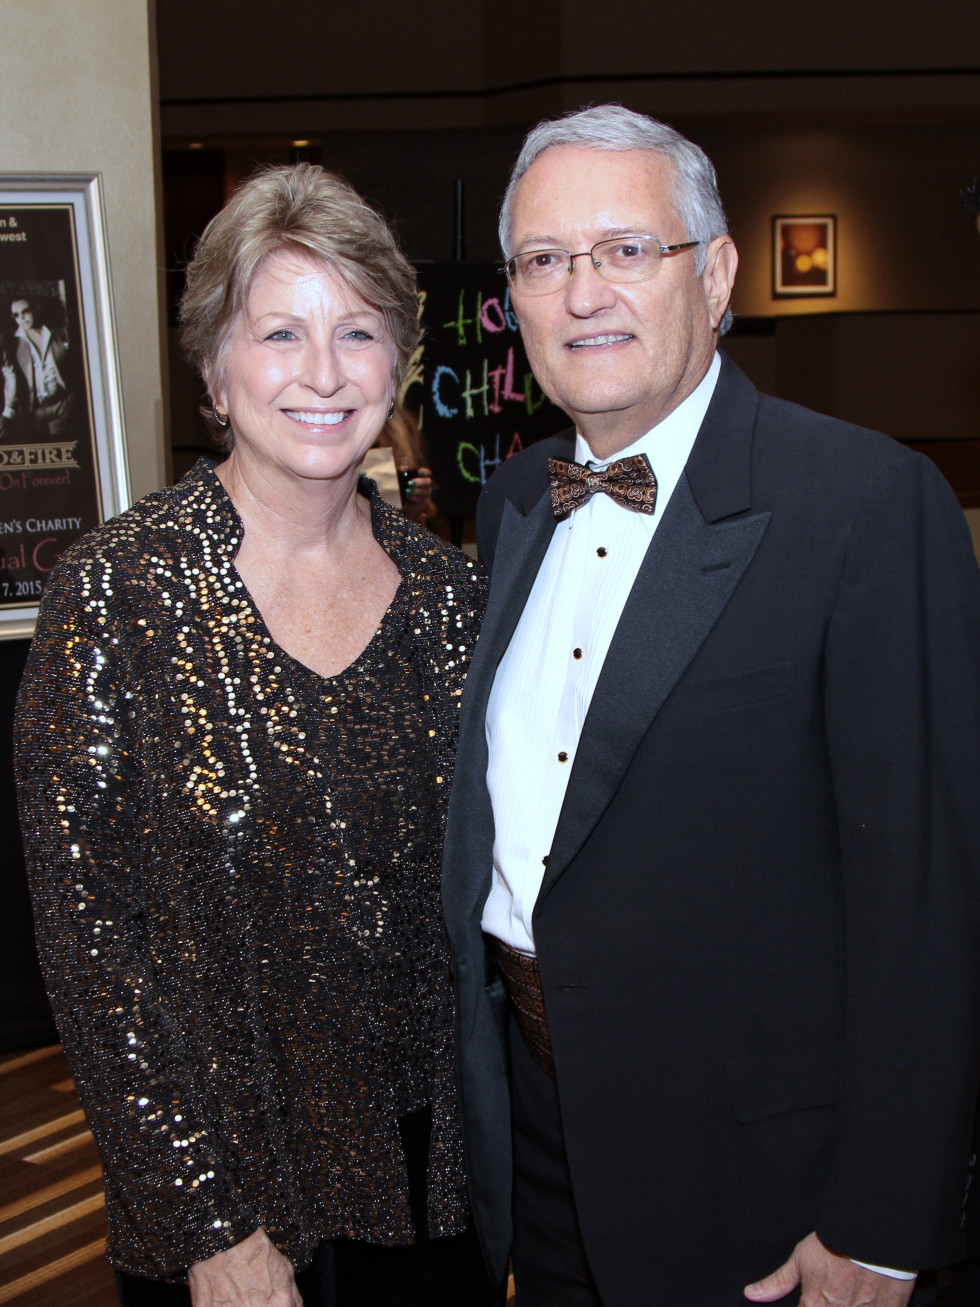 News, Shelby, Houston Children's Charity gala, NOv. 2015, Debbie Ogle, Bob Ogle